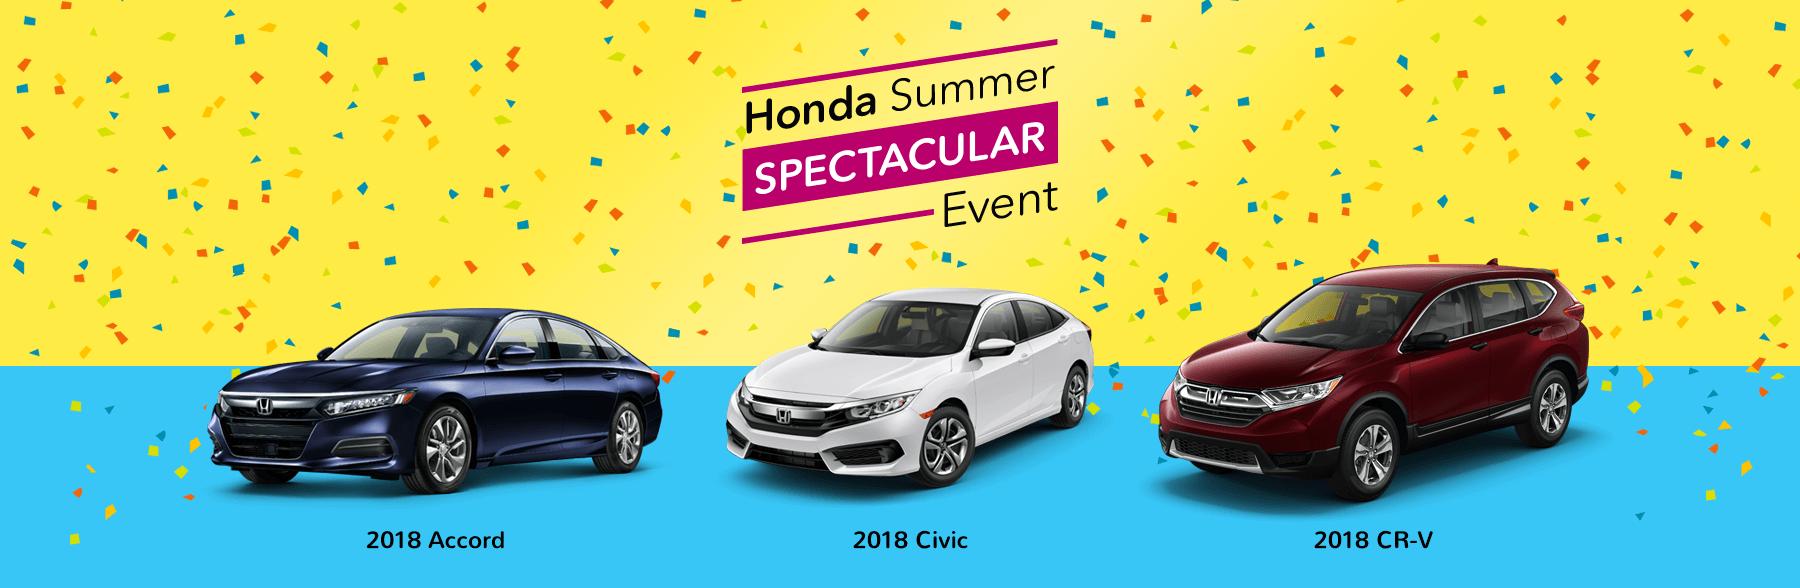 Honda Summer Spectacular Event Slider